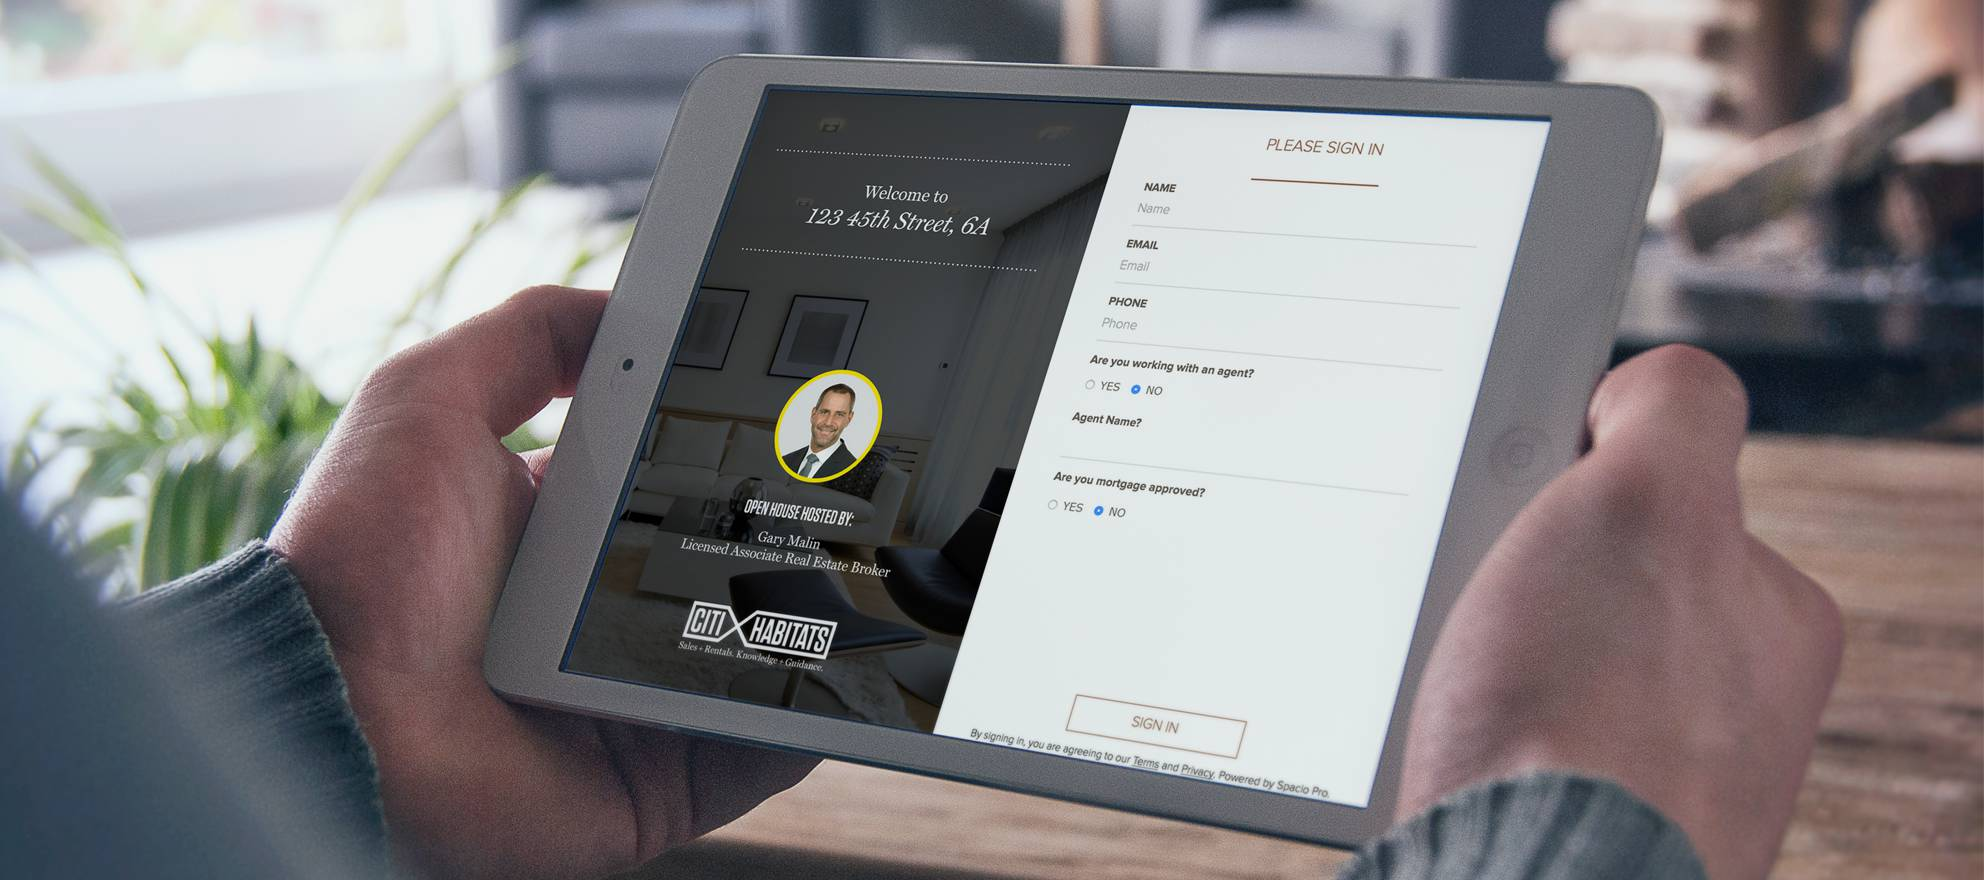 Open house iPad app Spacio Pro can show off RealSatisfied agent testimonials